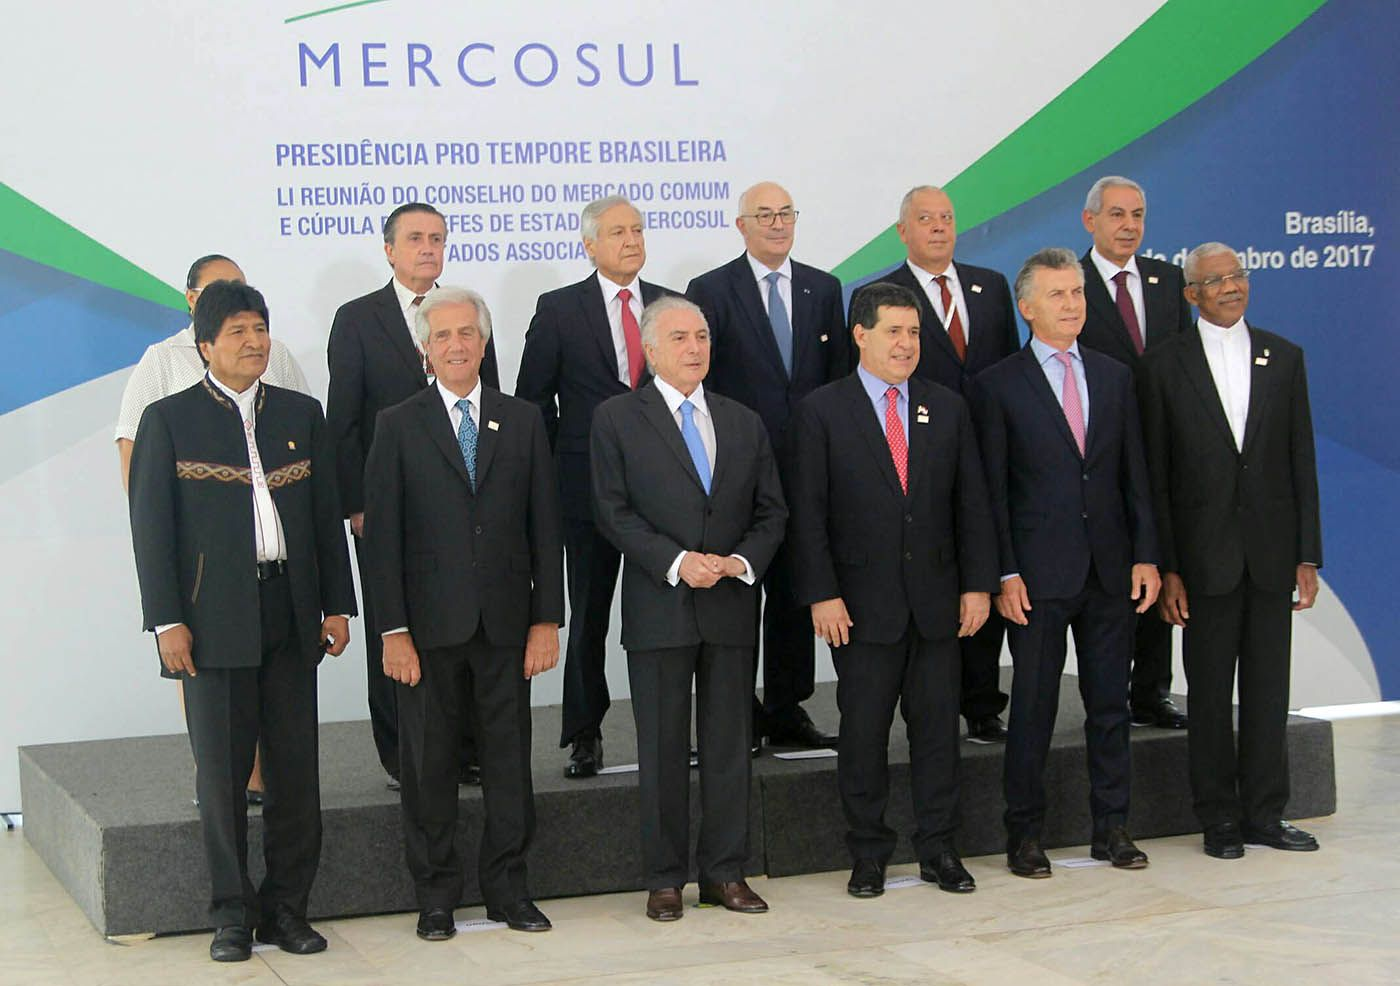 reunion-mercosur-2017.jpg